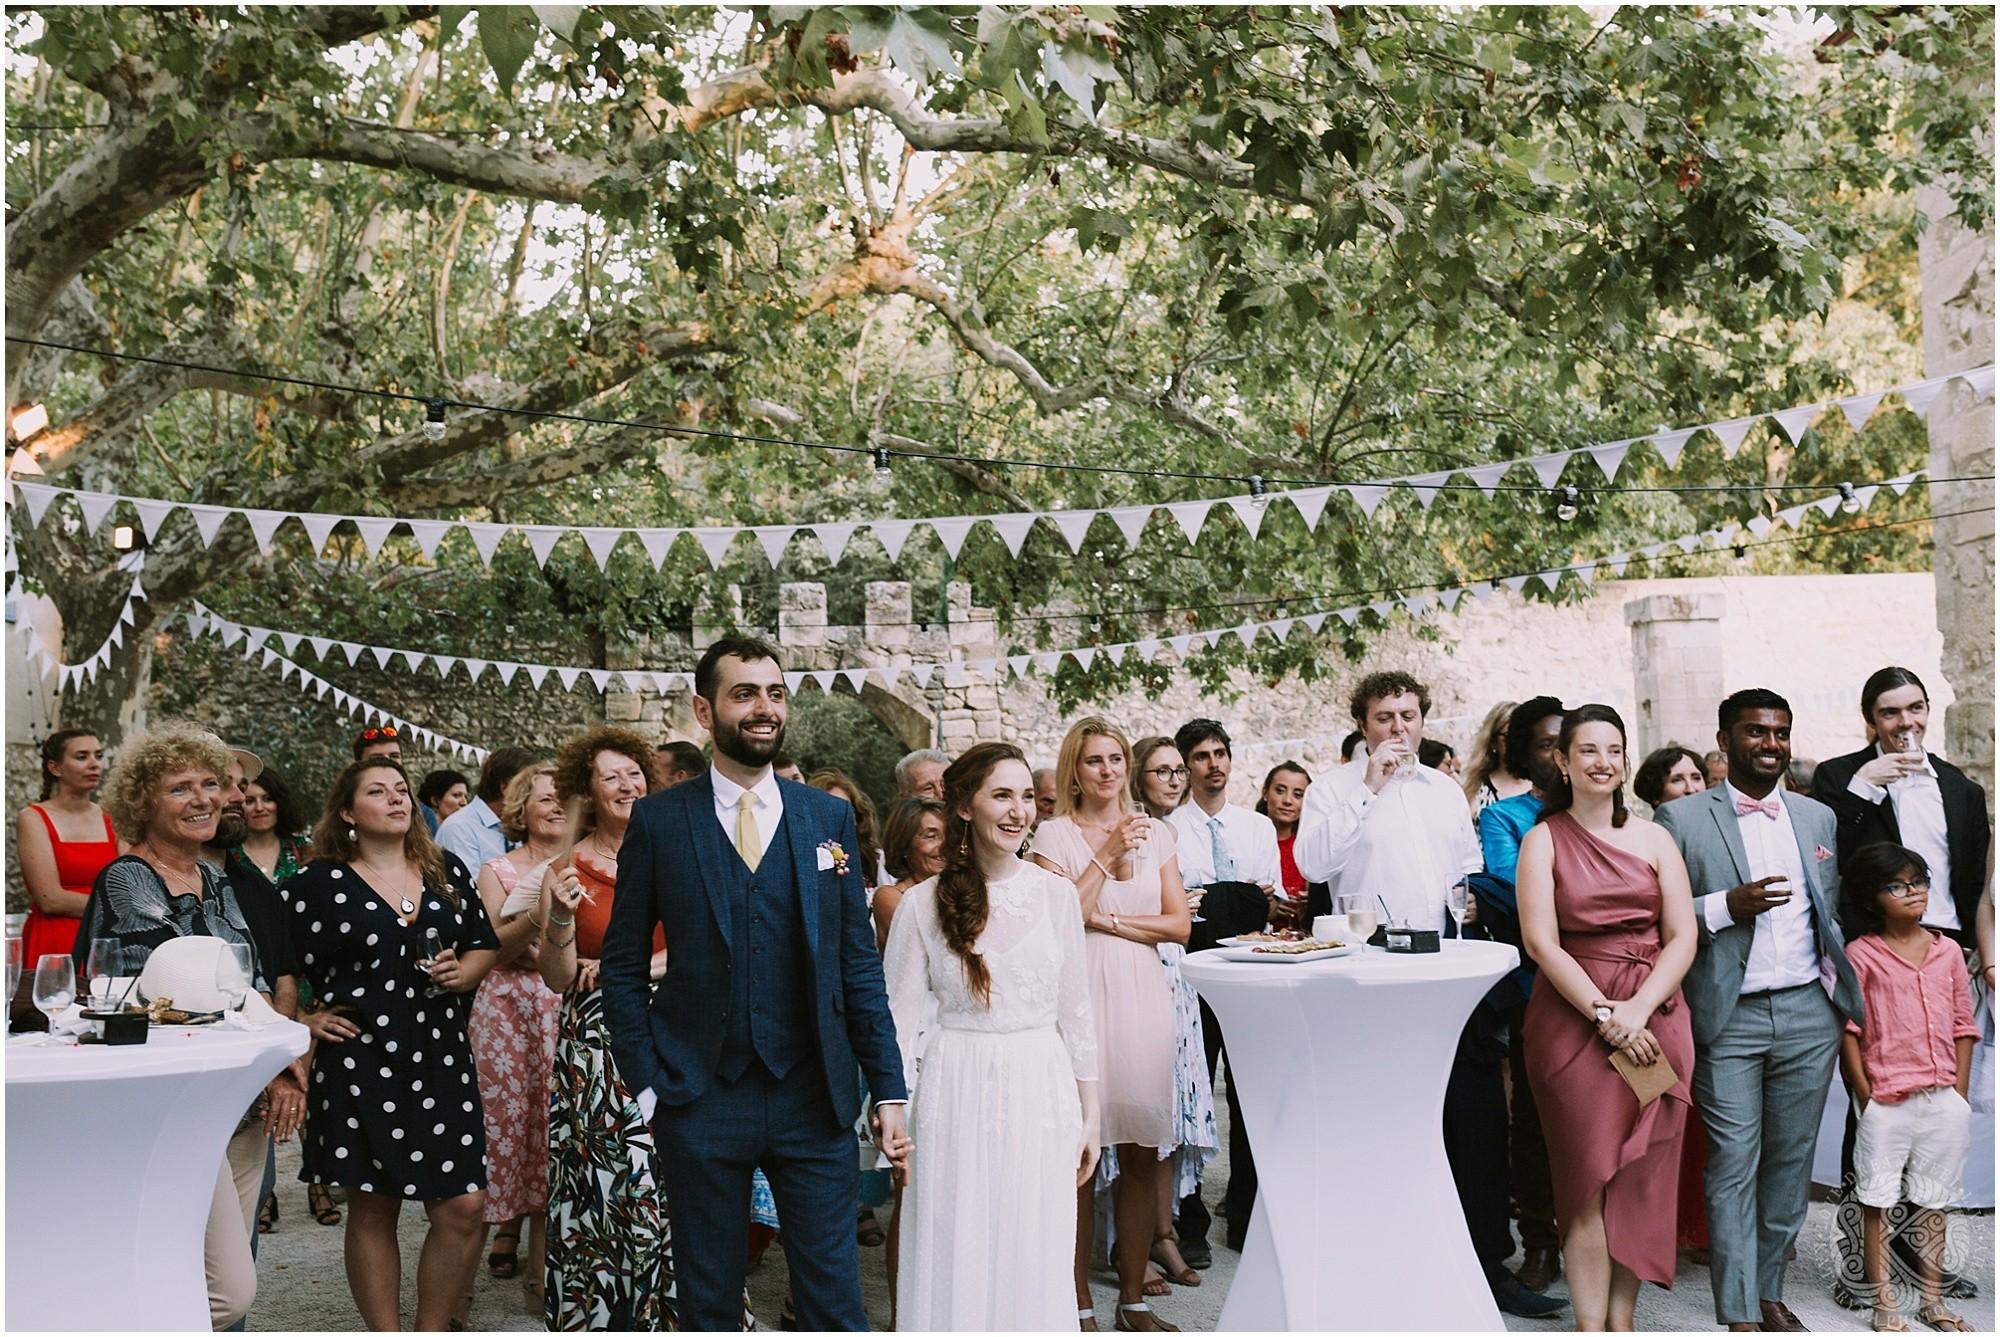 Kateryna-photos-photographe-mariage-vaucluse-provence-avignon-ferme-st-hugues_0070.jpg